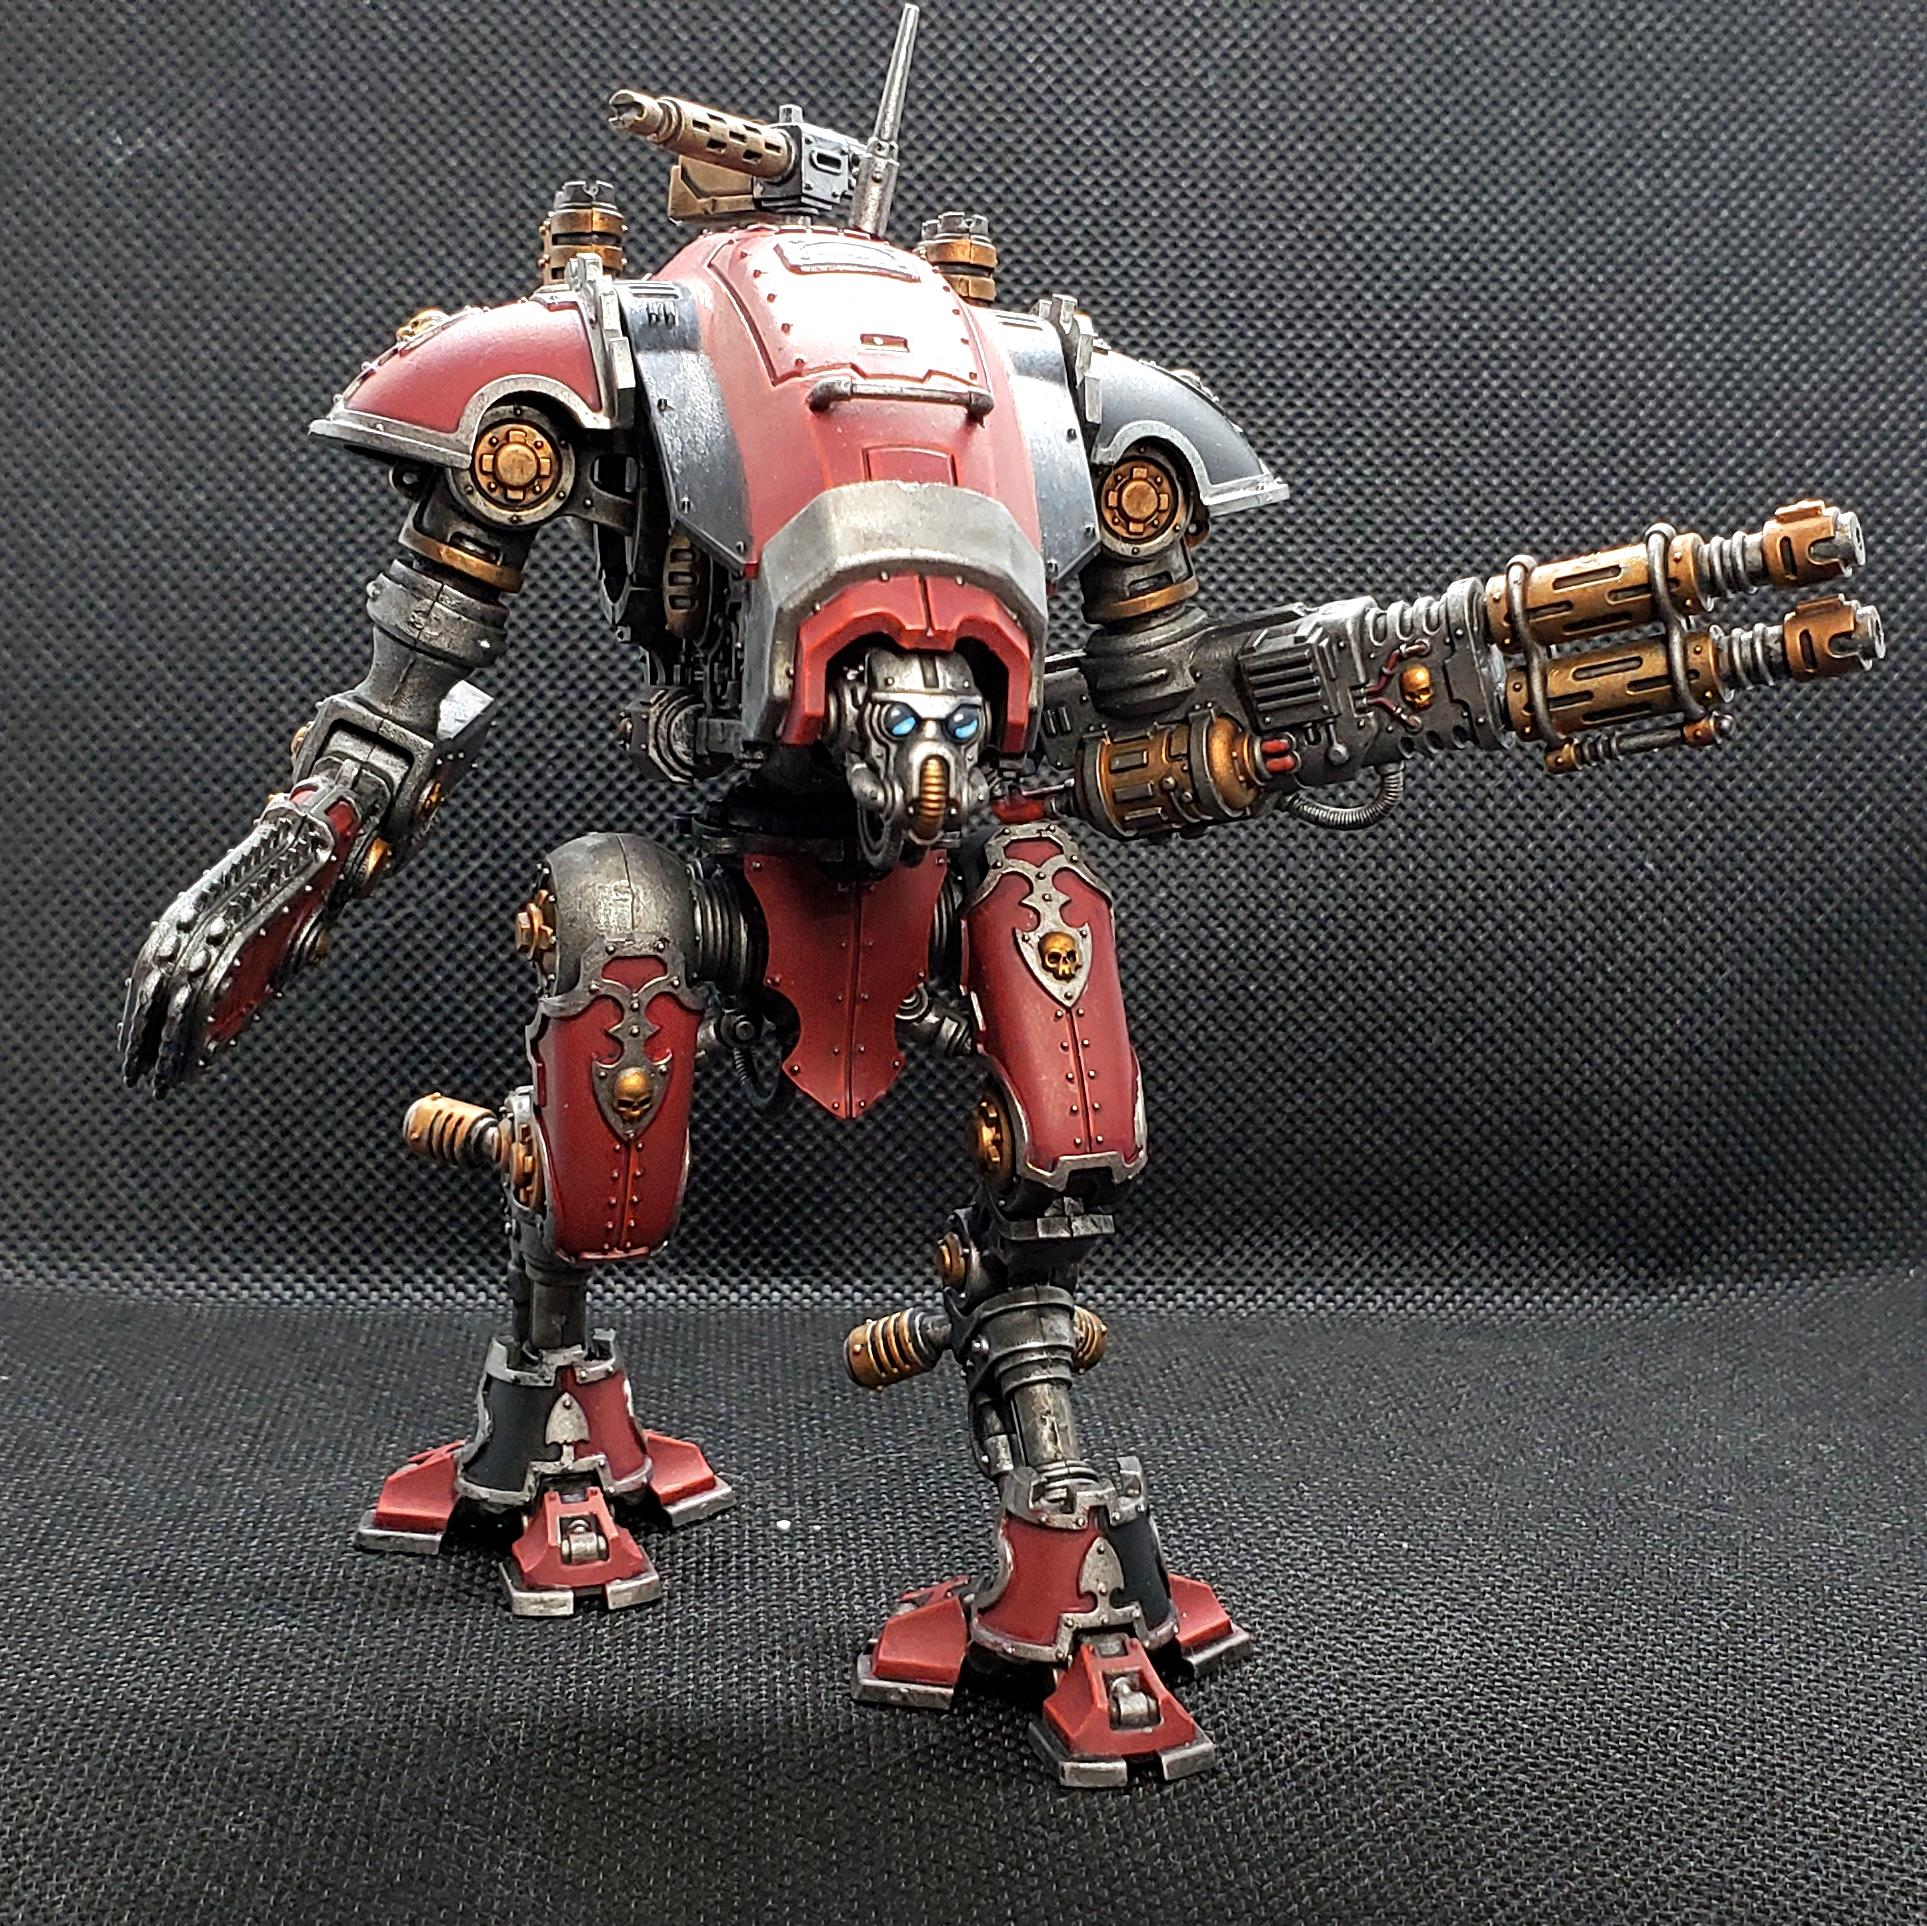 Adeptus Mechanicus, Admech, Armiger, Armiger Warglaive, Armiger Warglaives, Imperial Knights, Warhammer 40,000